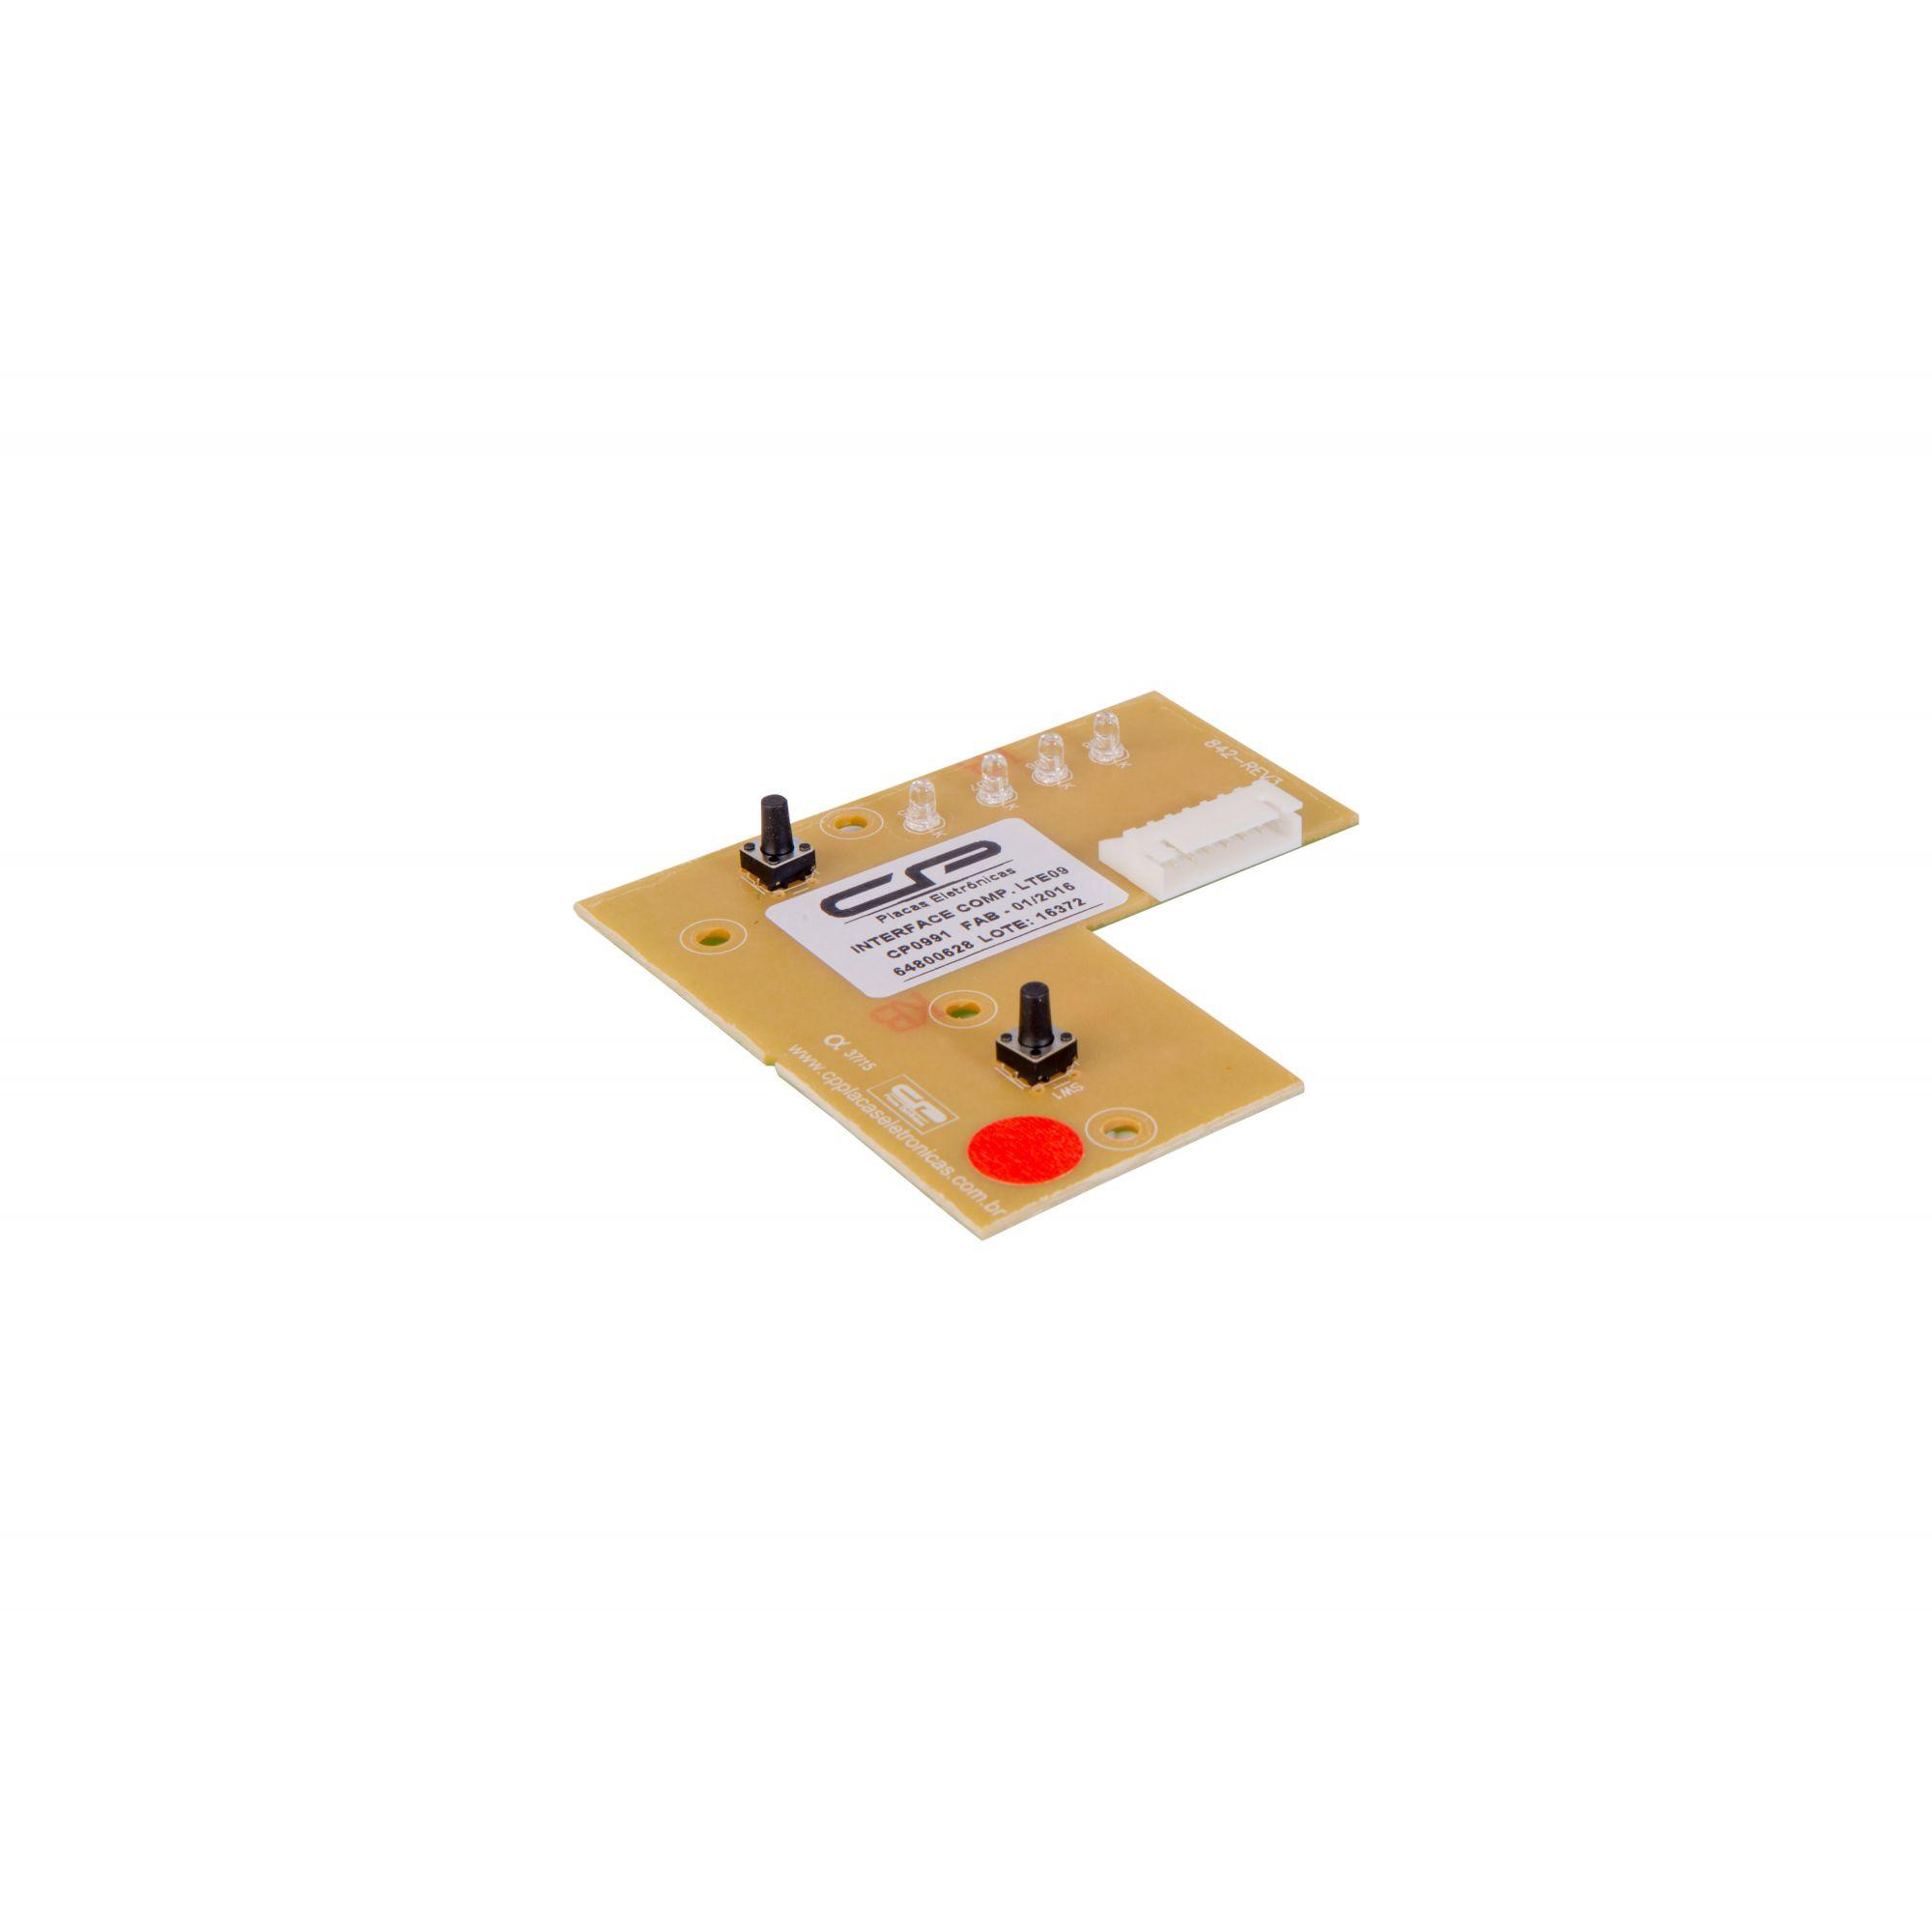 Placa Interface Lavadora Electrolux Lte09 Bivolt Cp  (CP991)